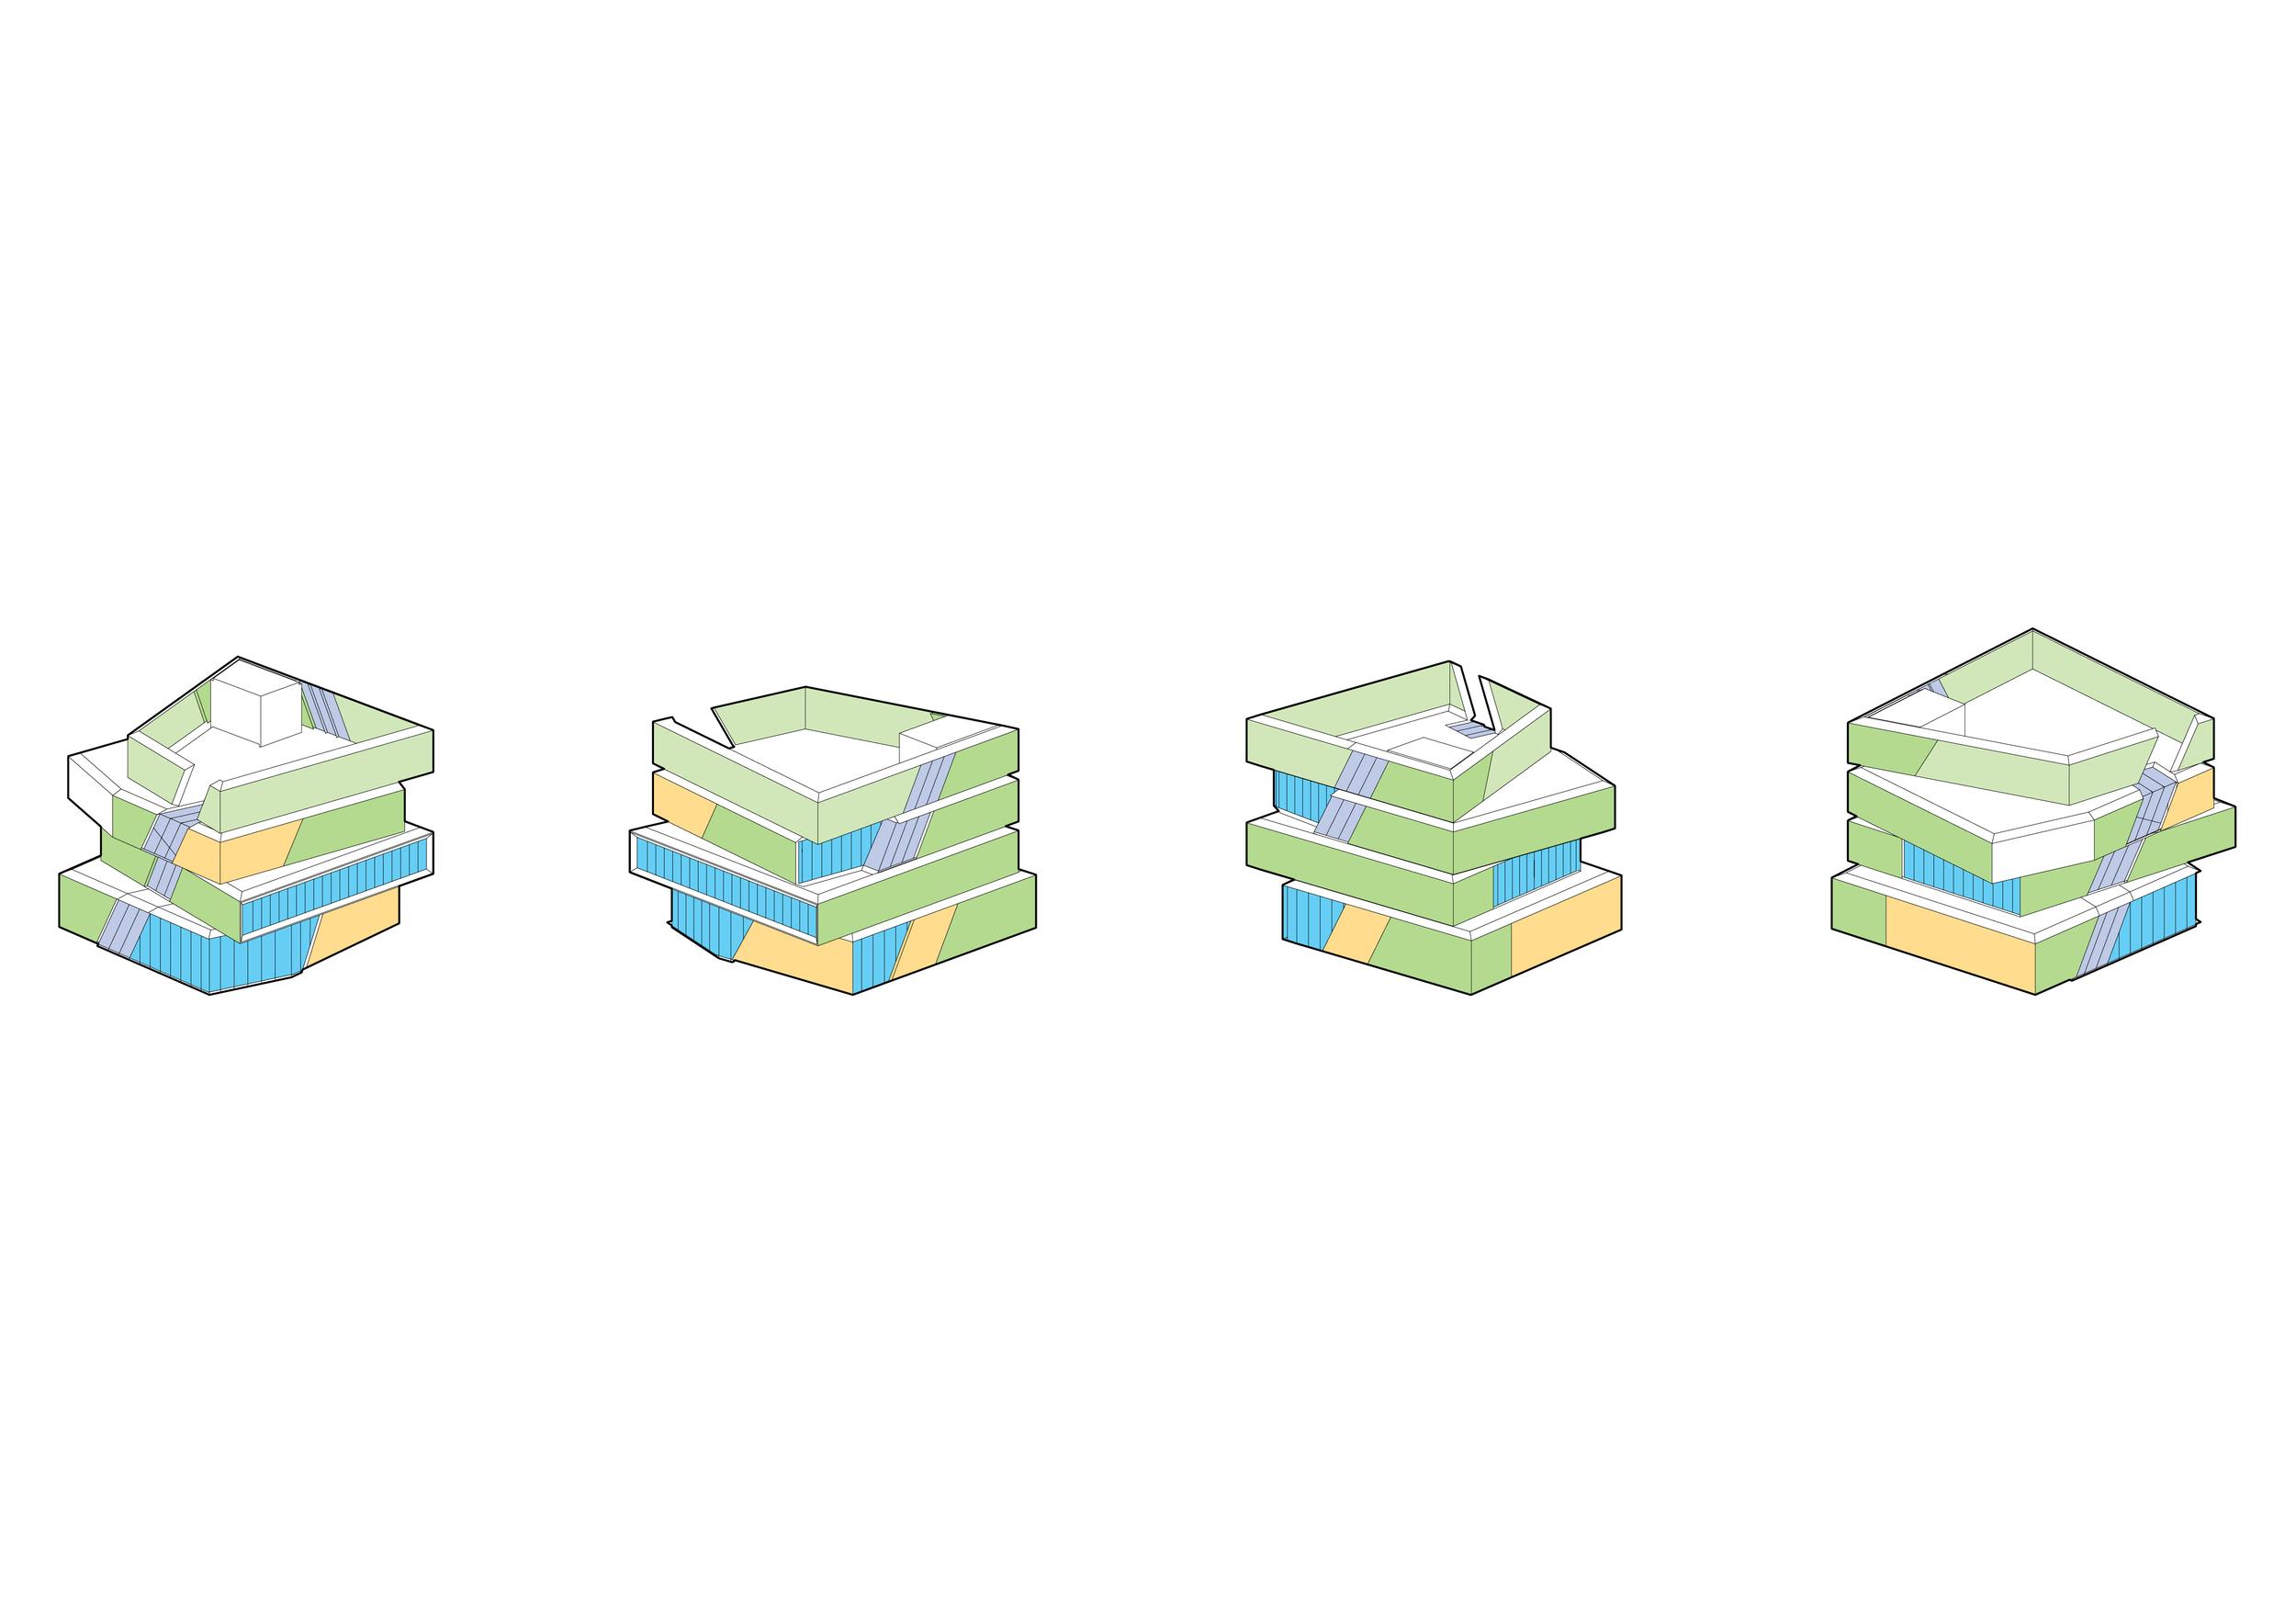 56130_Axon Diagrams-01.jpg